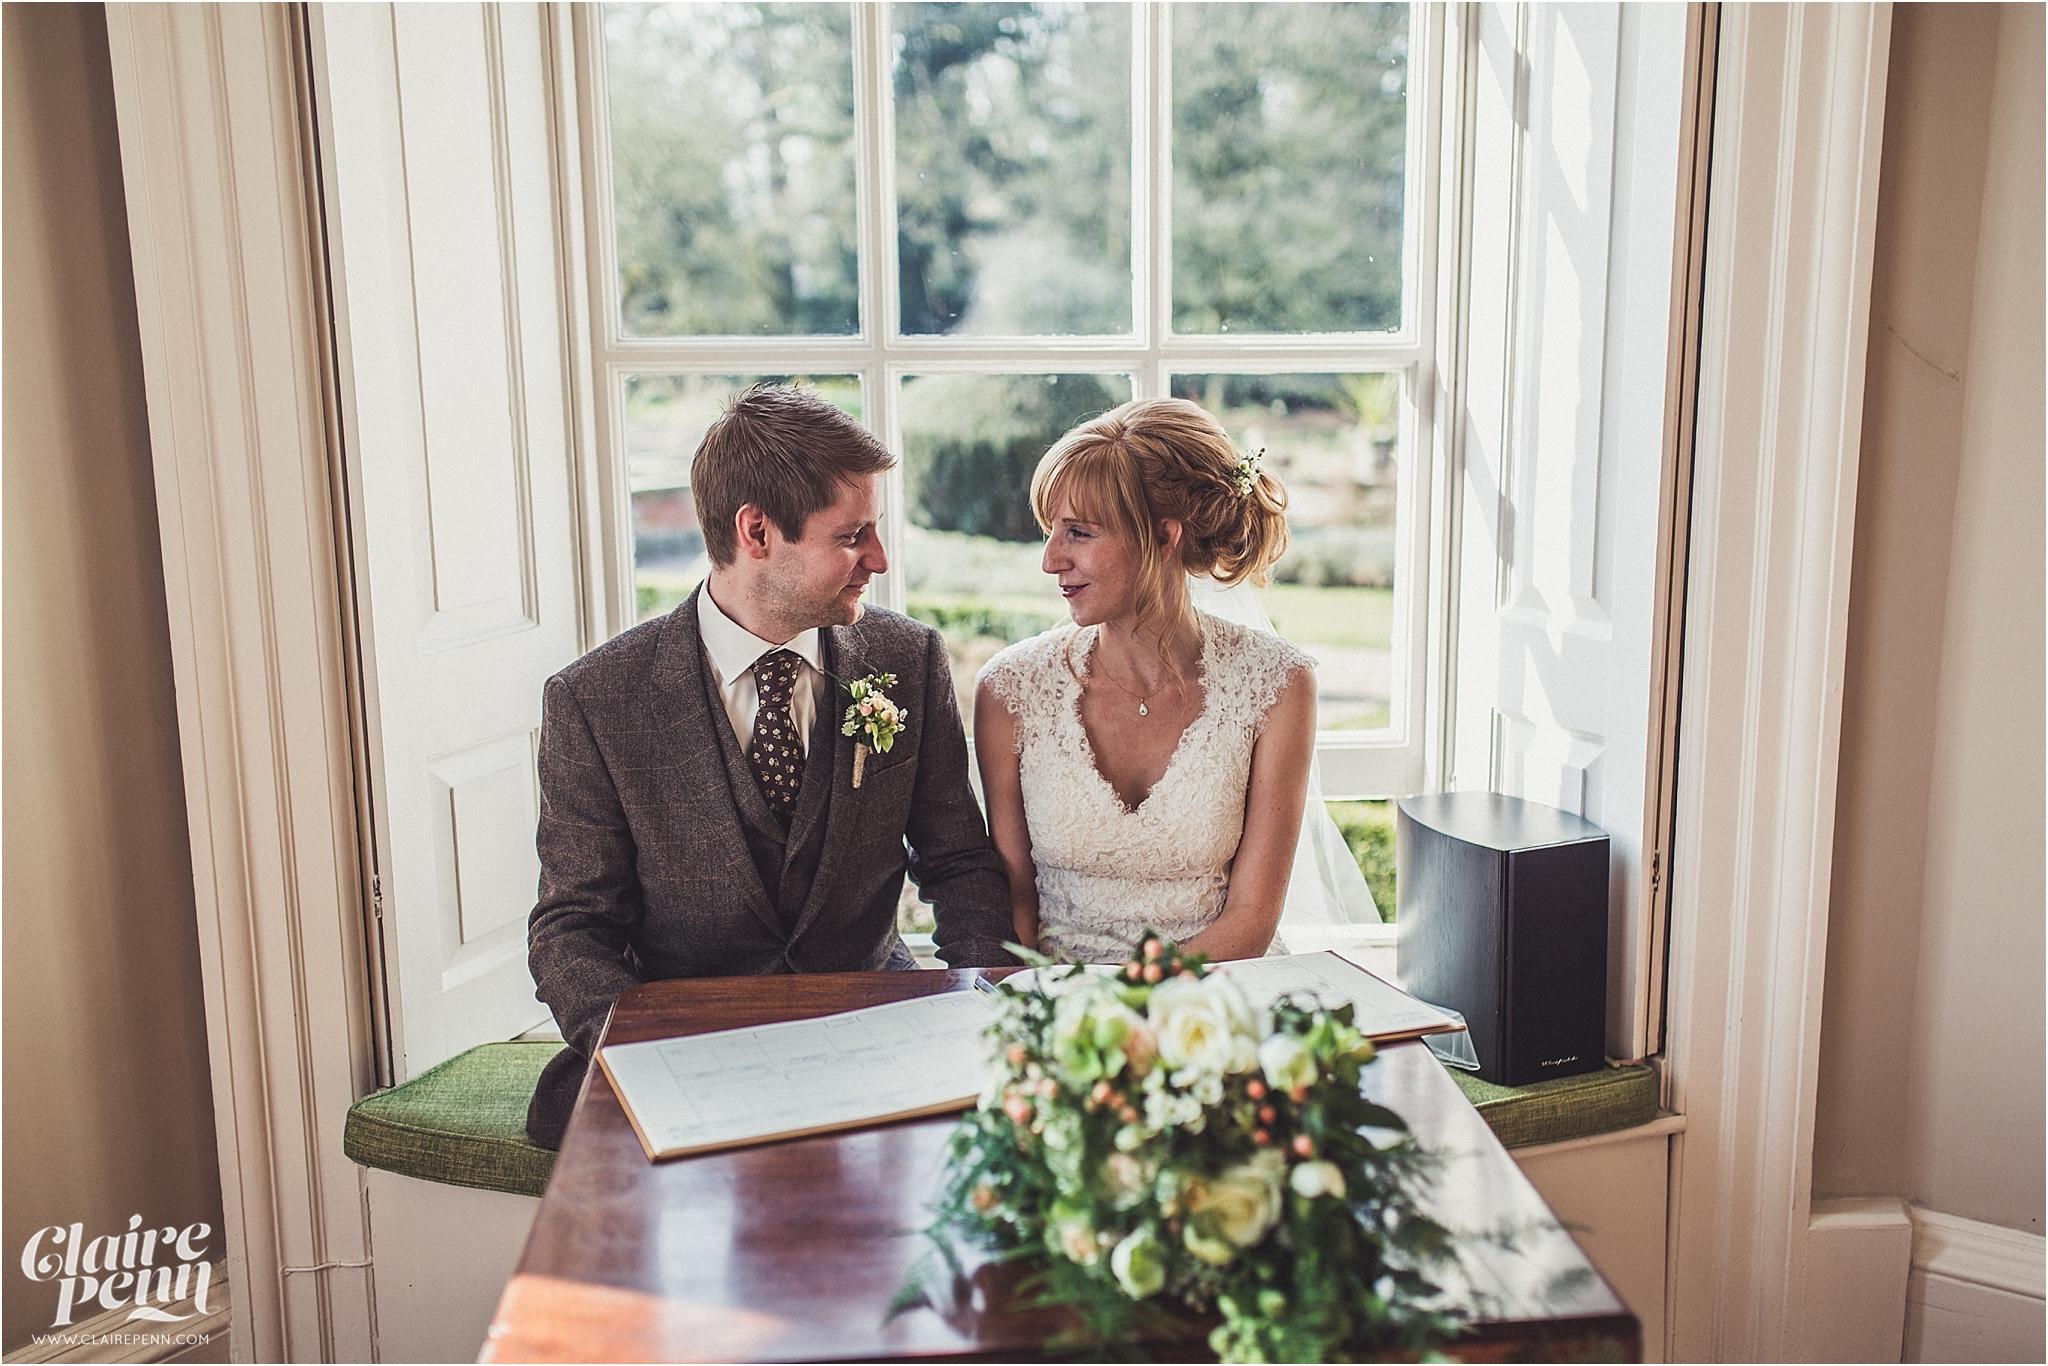 Iscoyd Park wedding, Whitchurch, Cheshire wedding photographer_0022.jpg